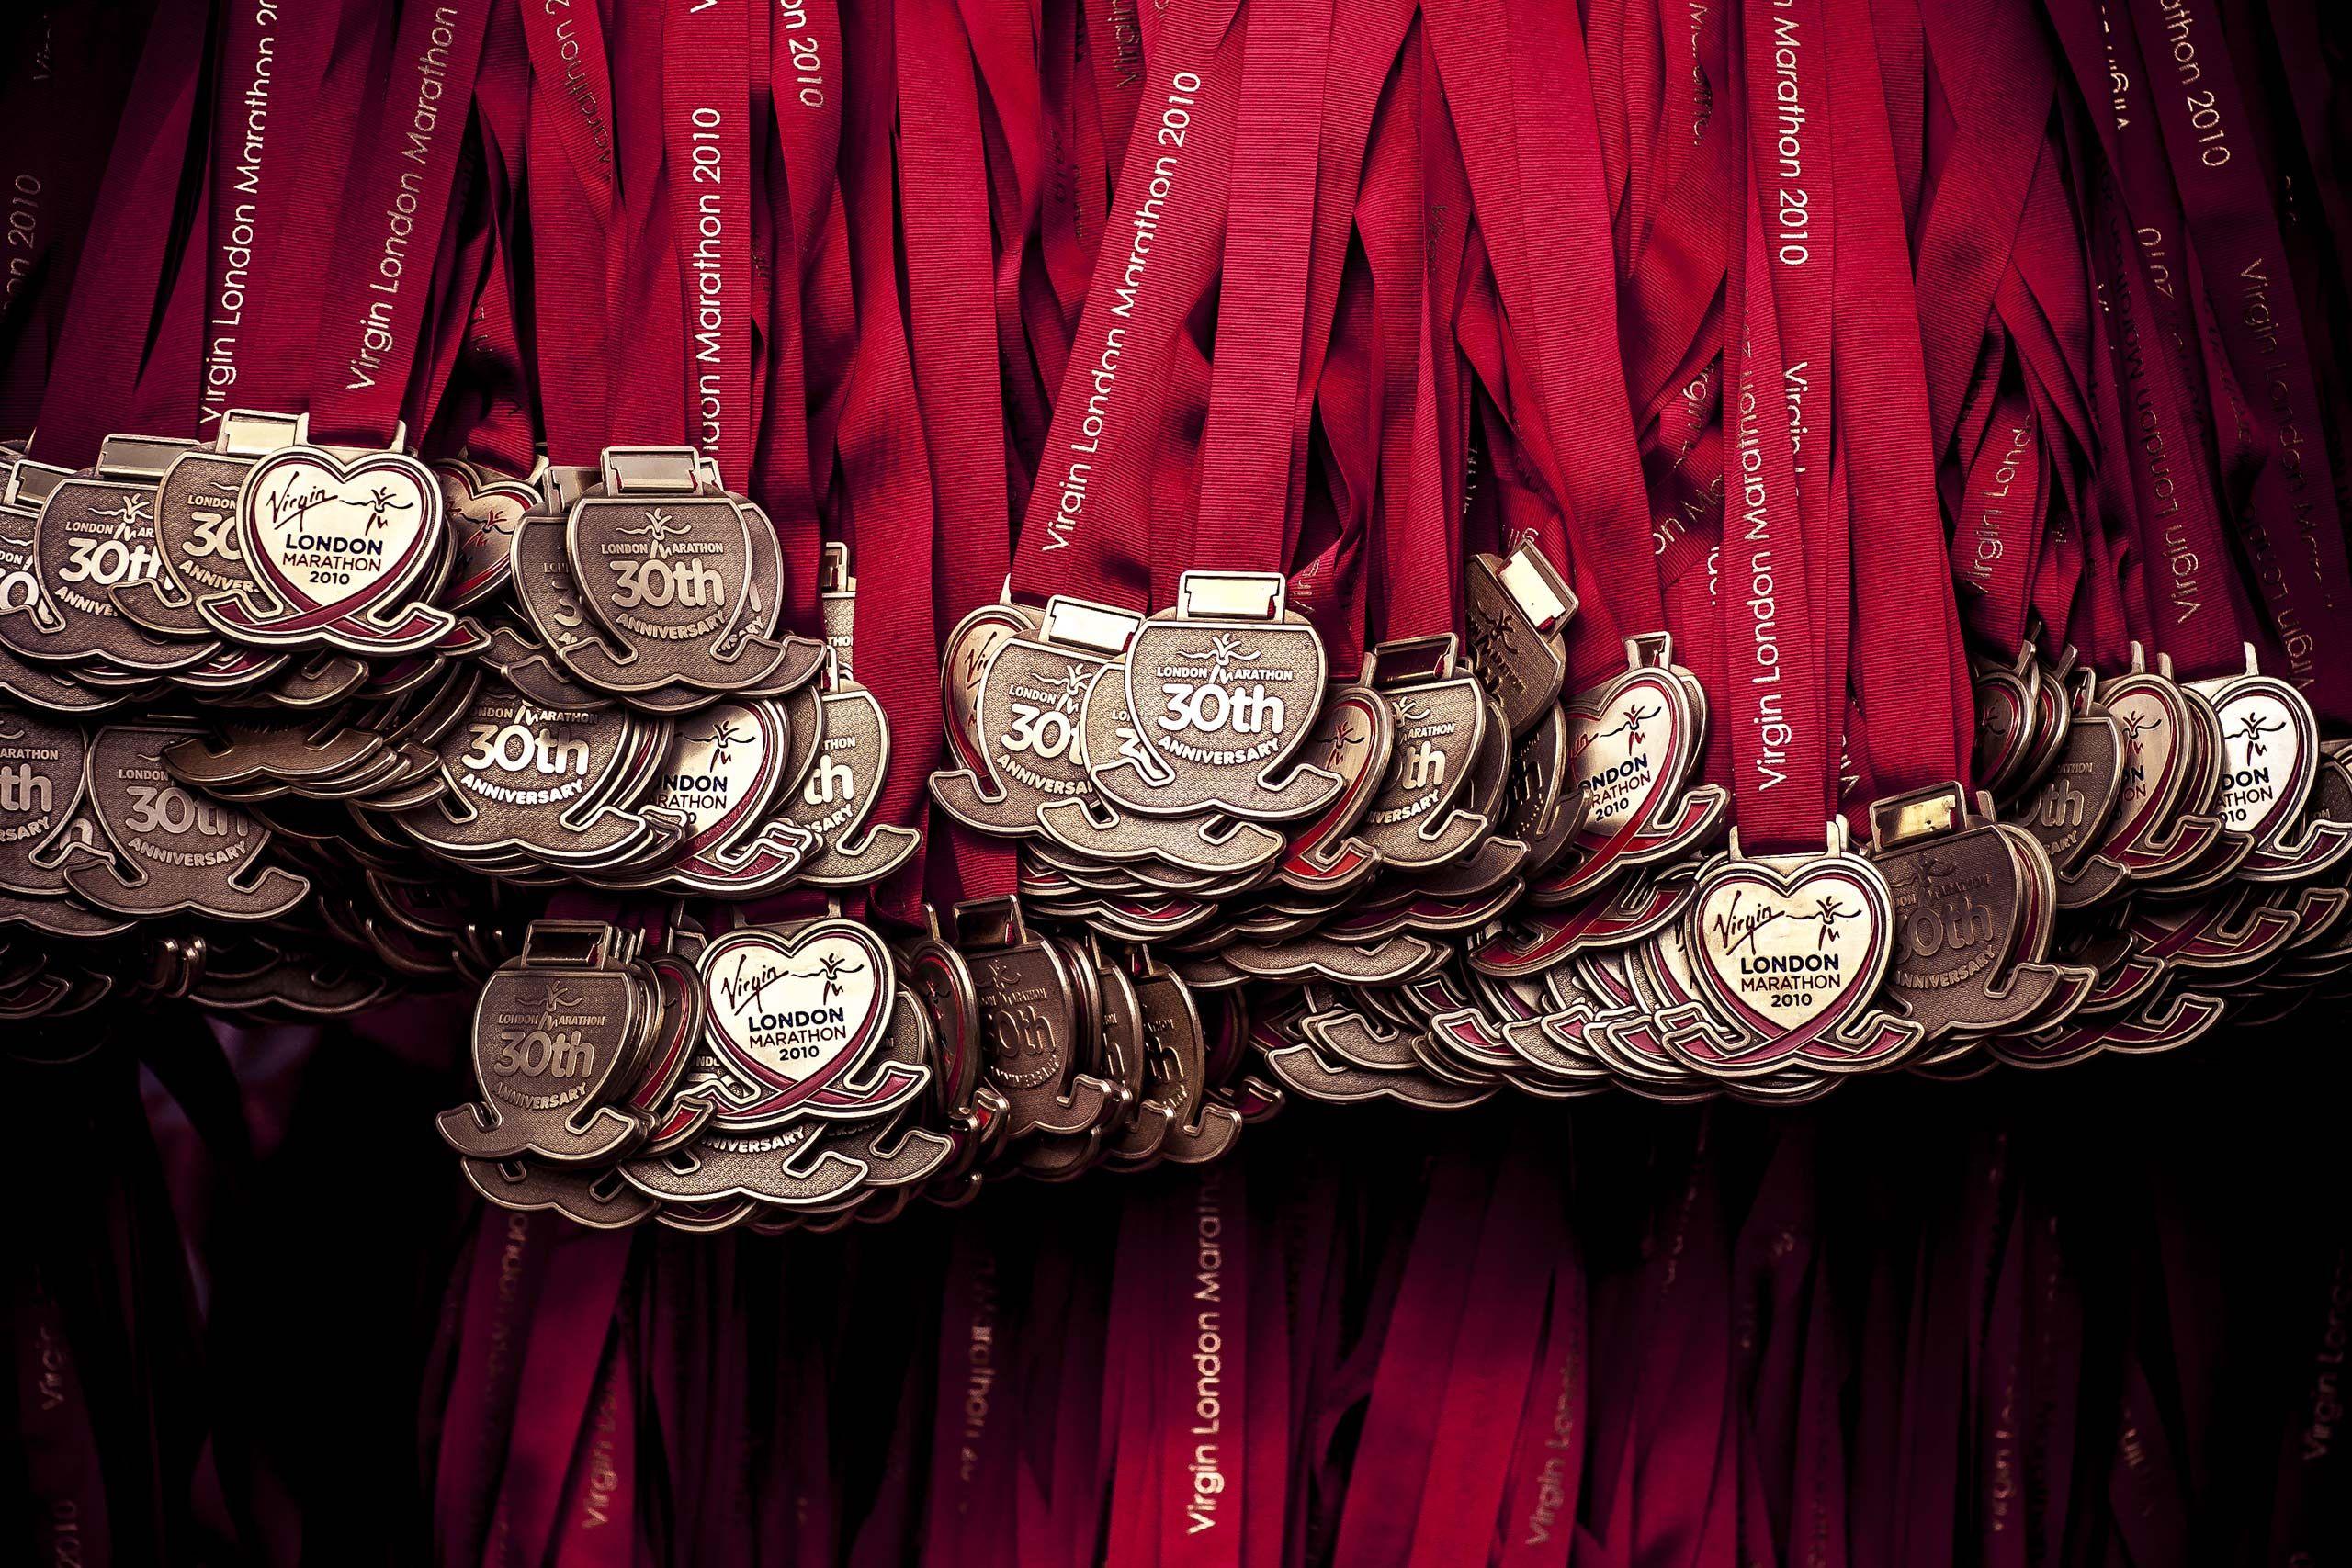 Virgin London Marathon Medal